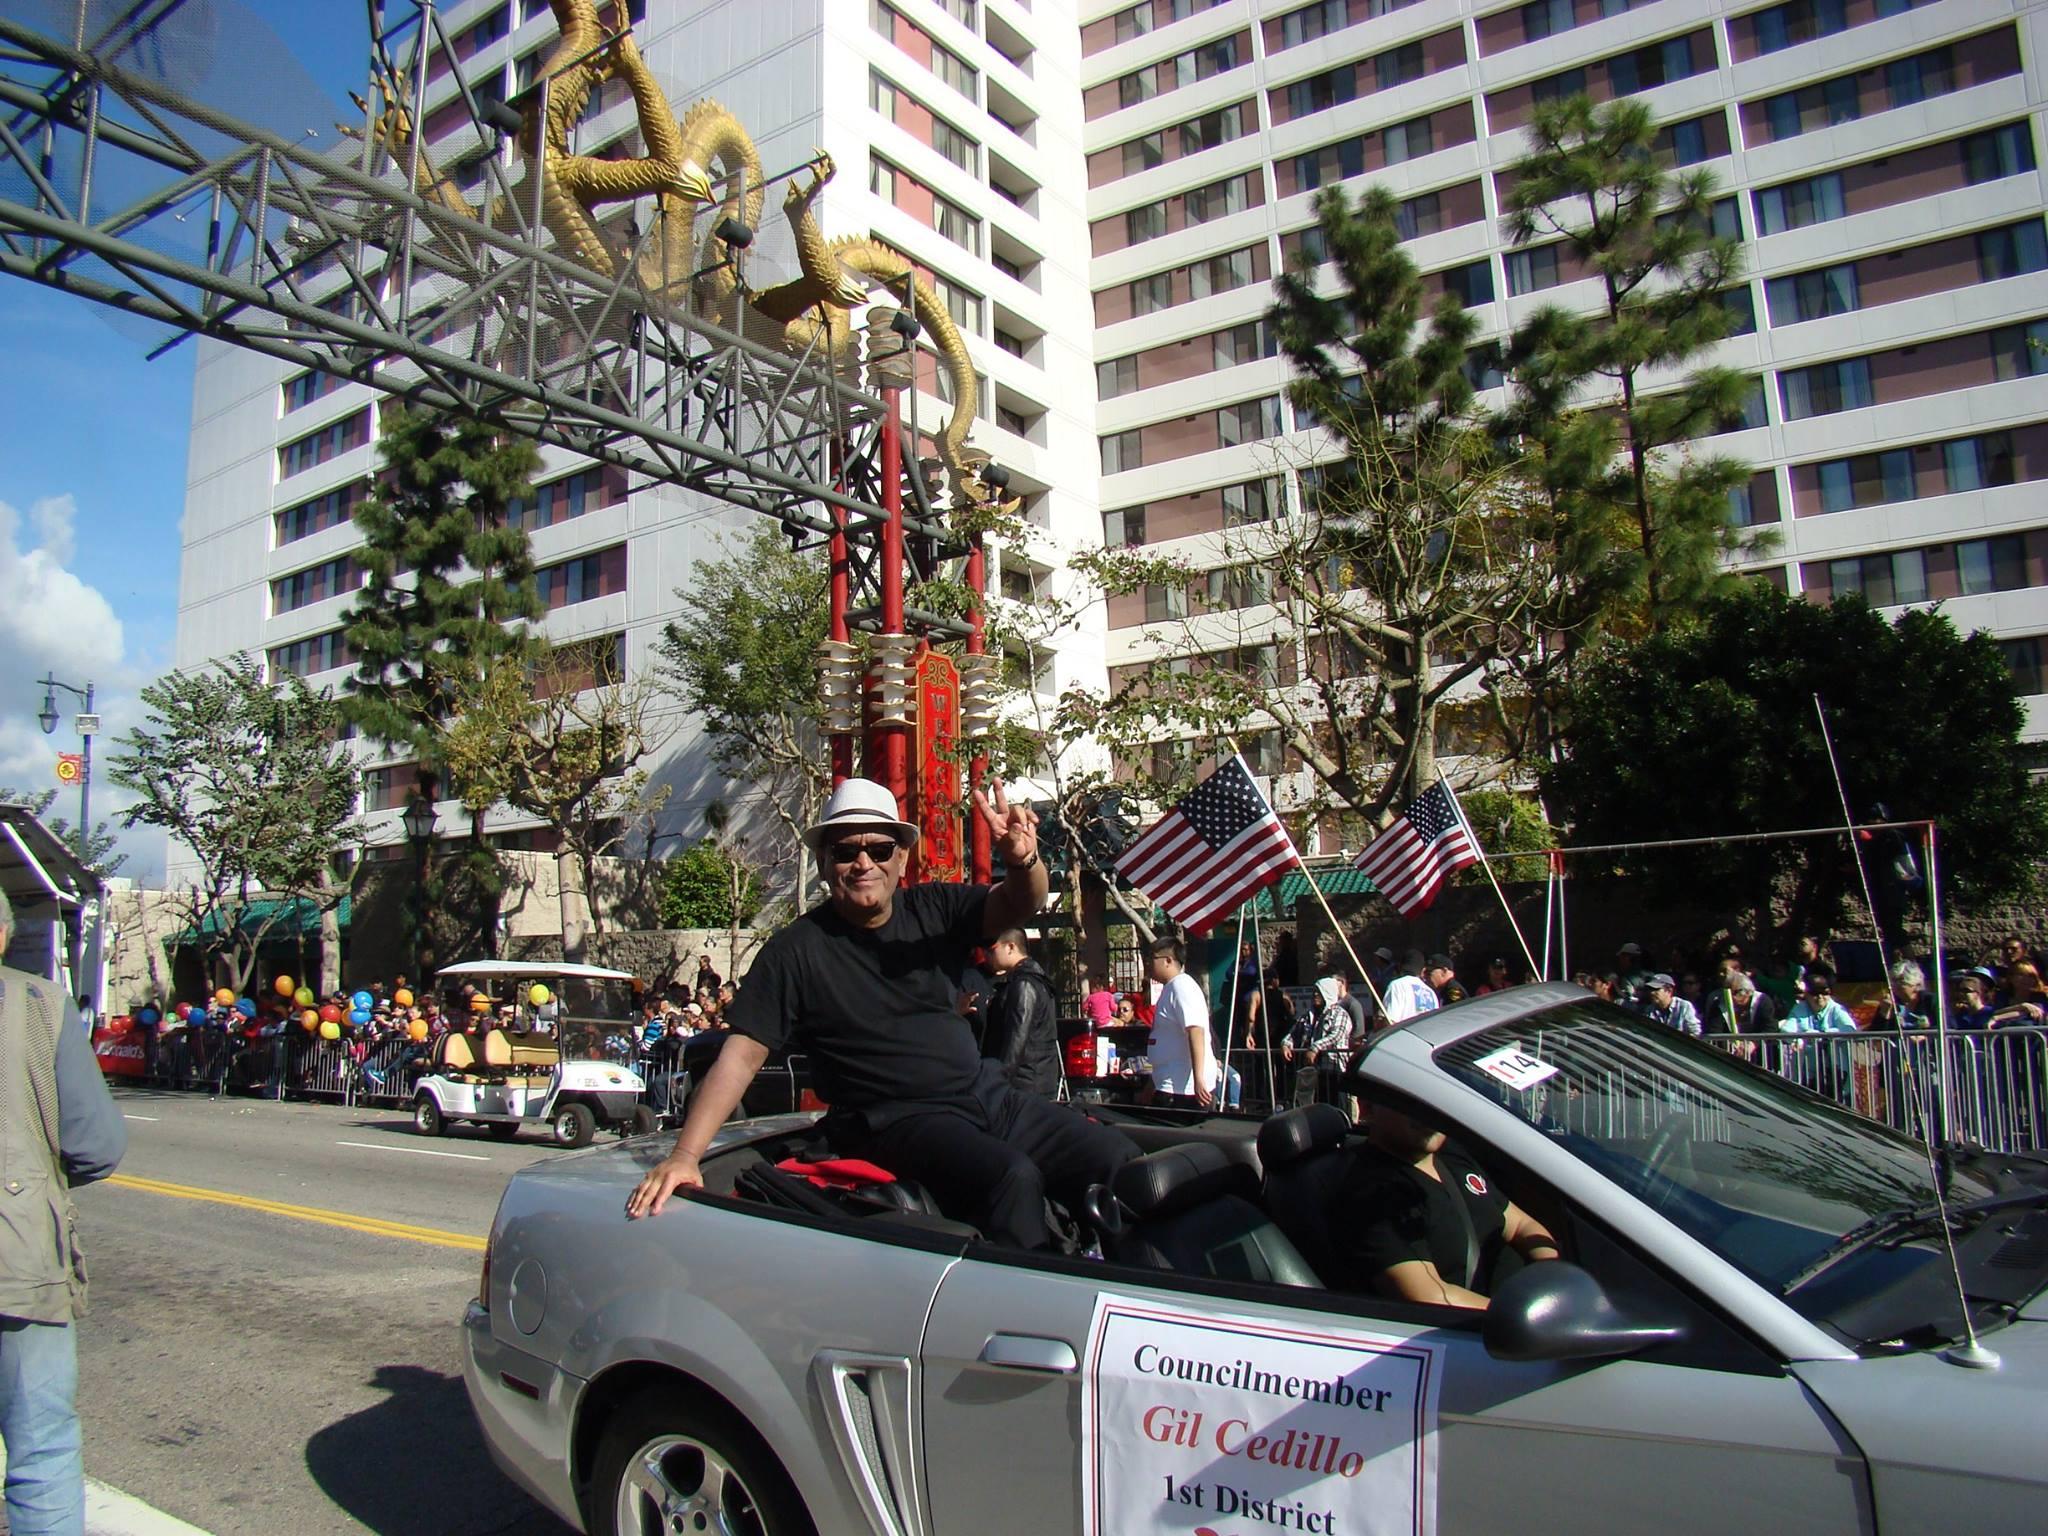 Hon. Gilbert Cedillo, L.A. City Councilmember, 1st District.jpg